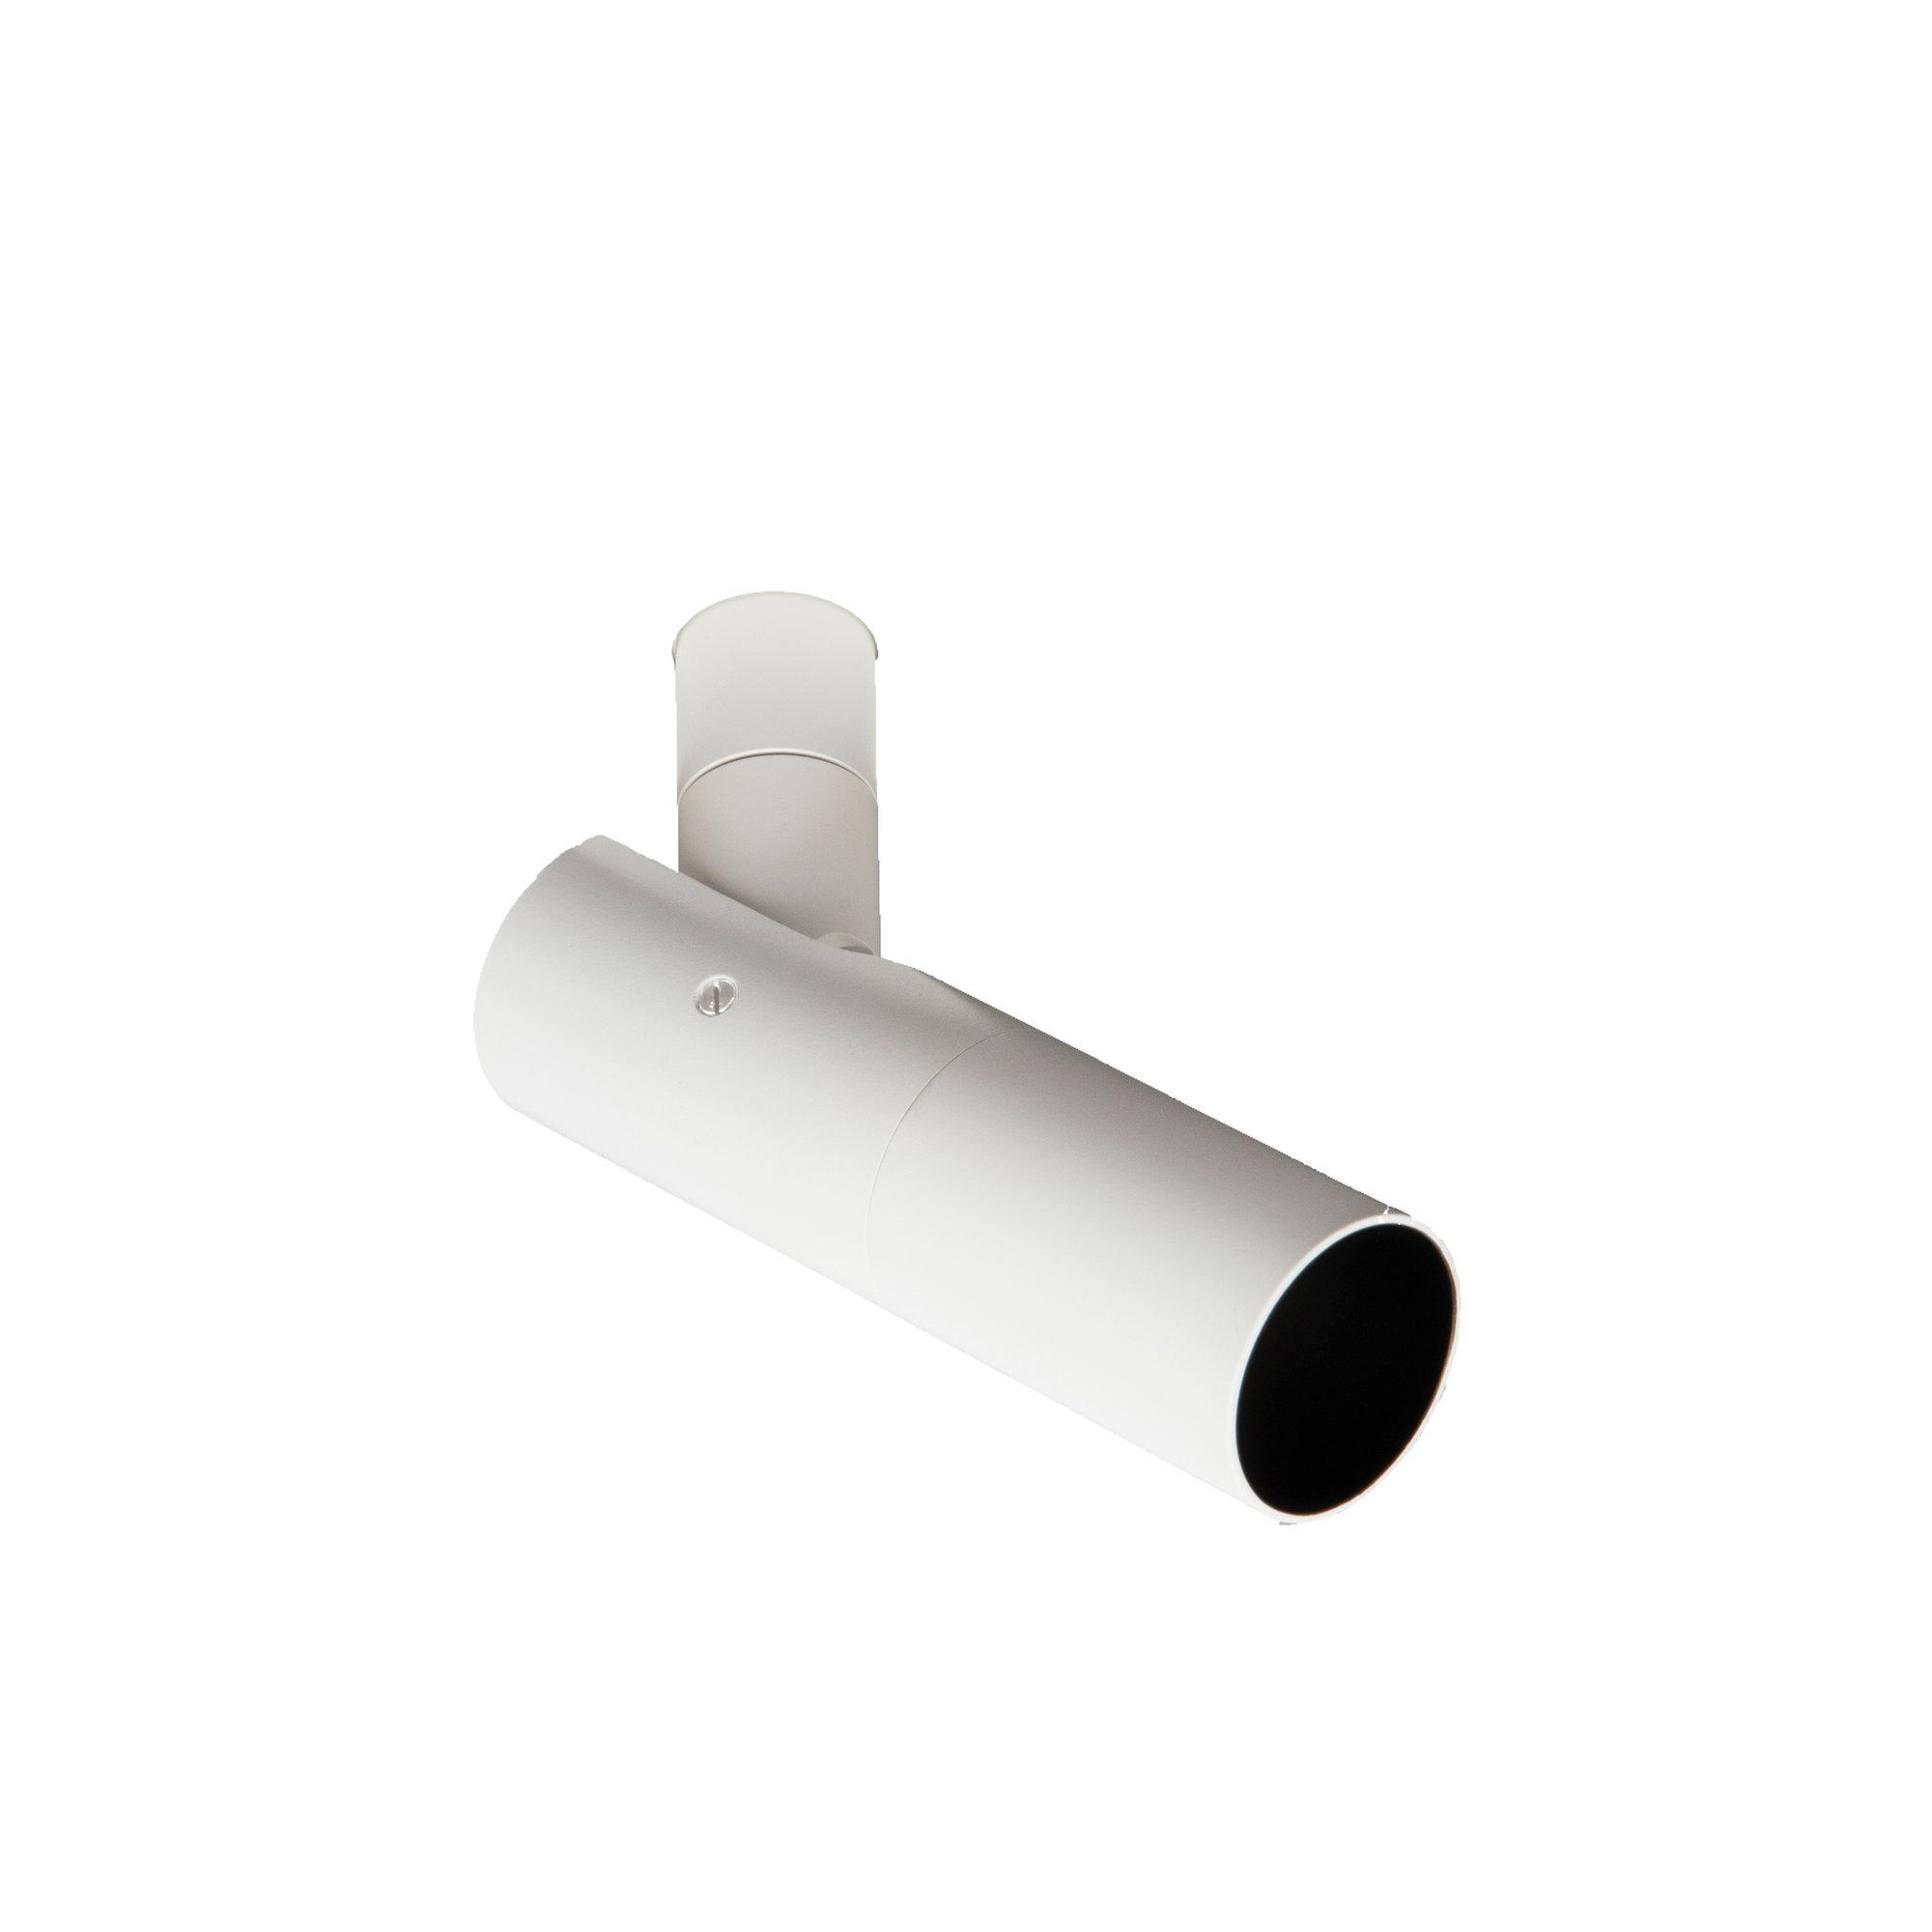 Vorsa Port Pure Plaster-in Base White